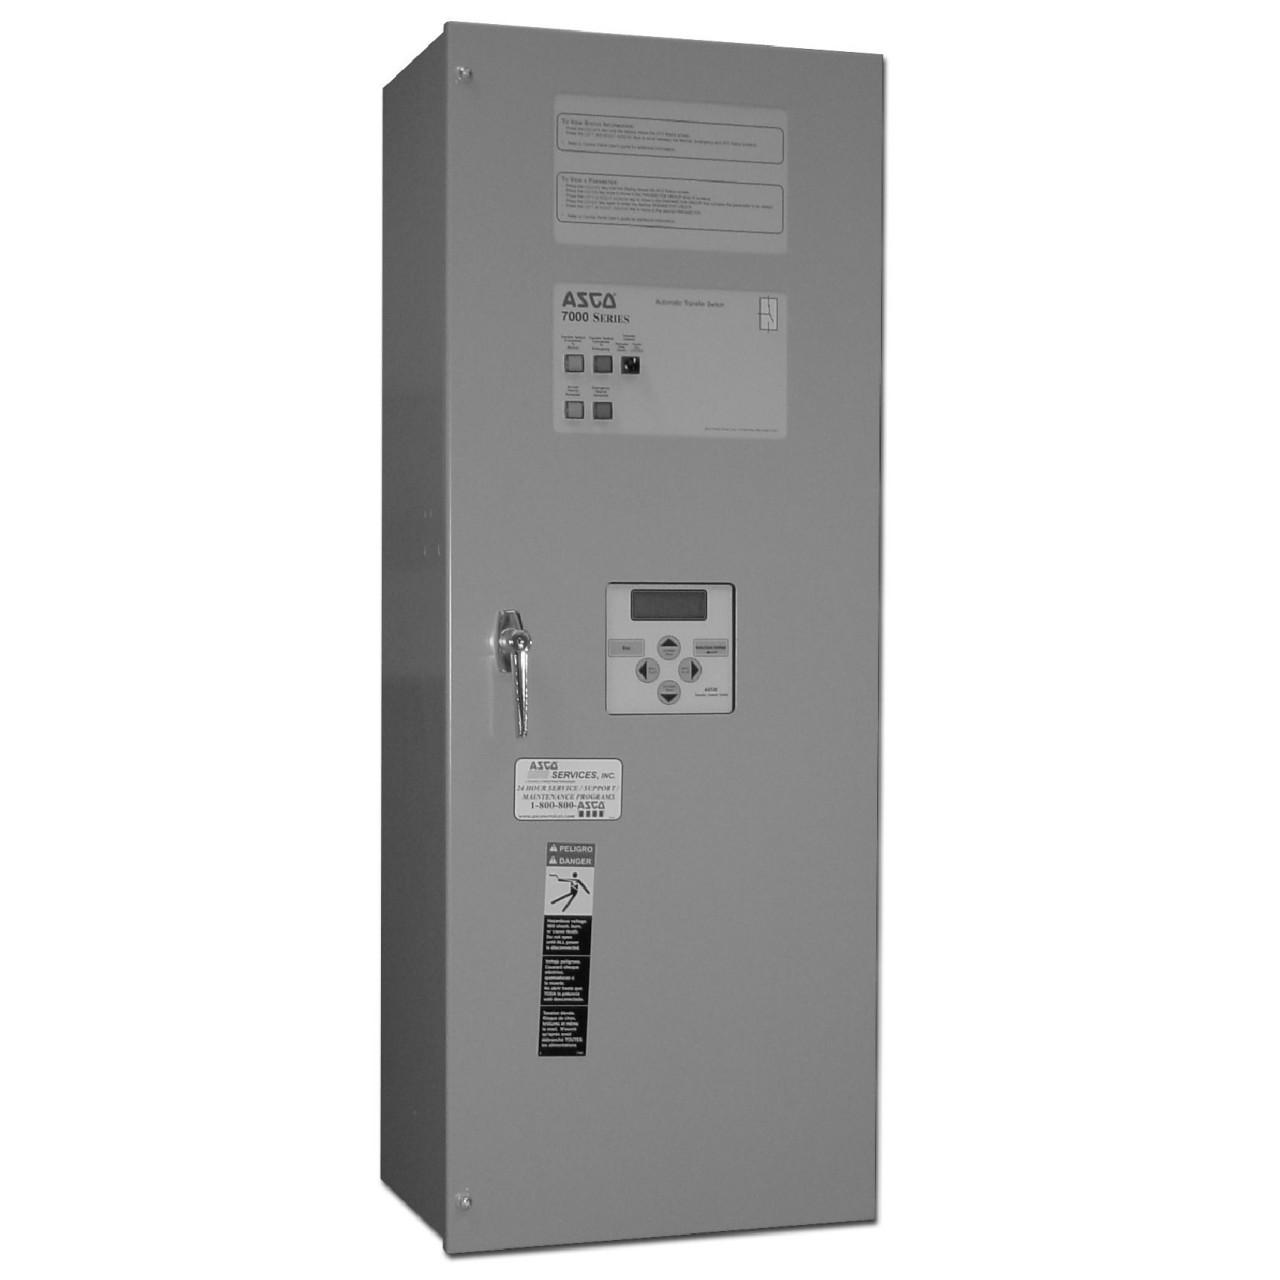 Asco 7000 Manual Transfer Switch (1Ph, 200A)